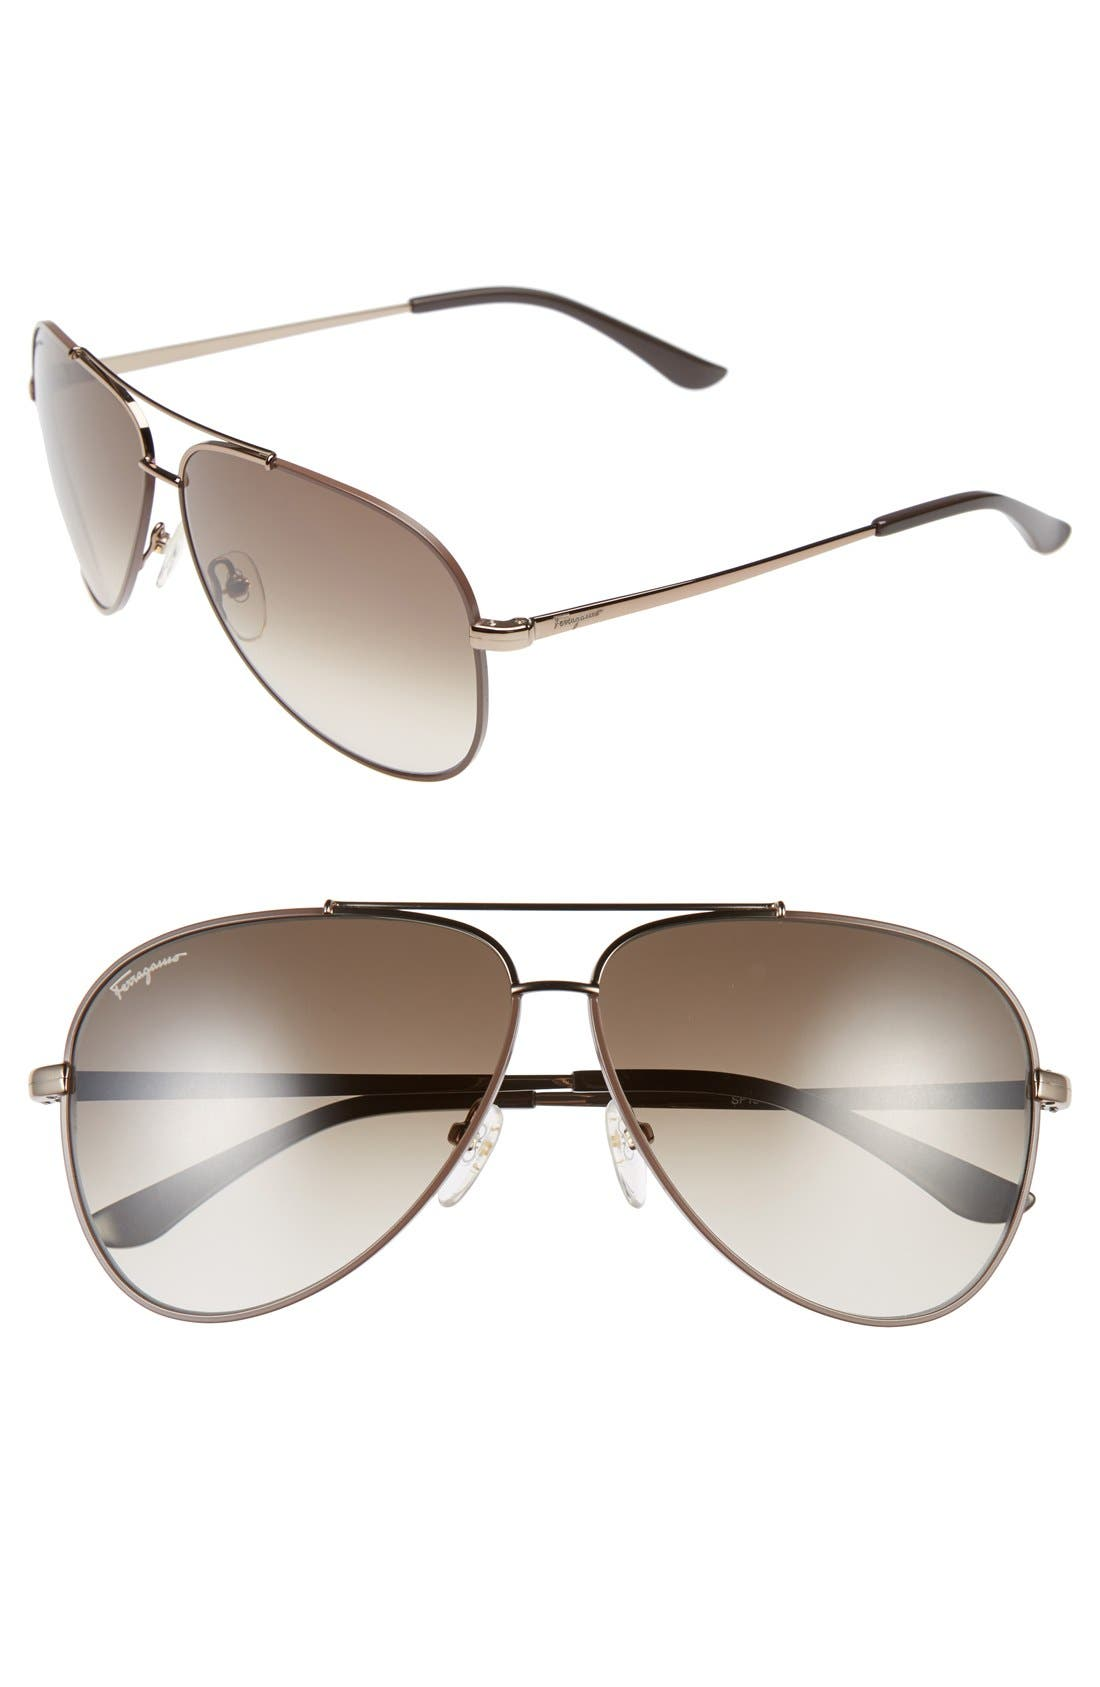 Main Image - Salvatore Ferragamo 60mm Aviator Sunglasses